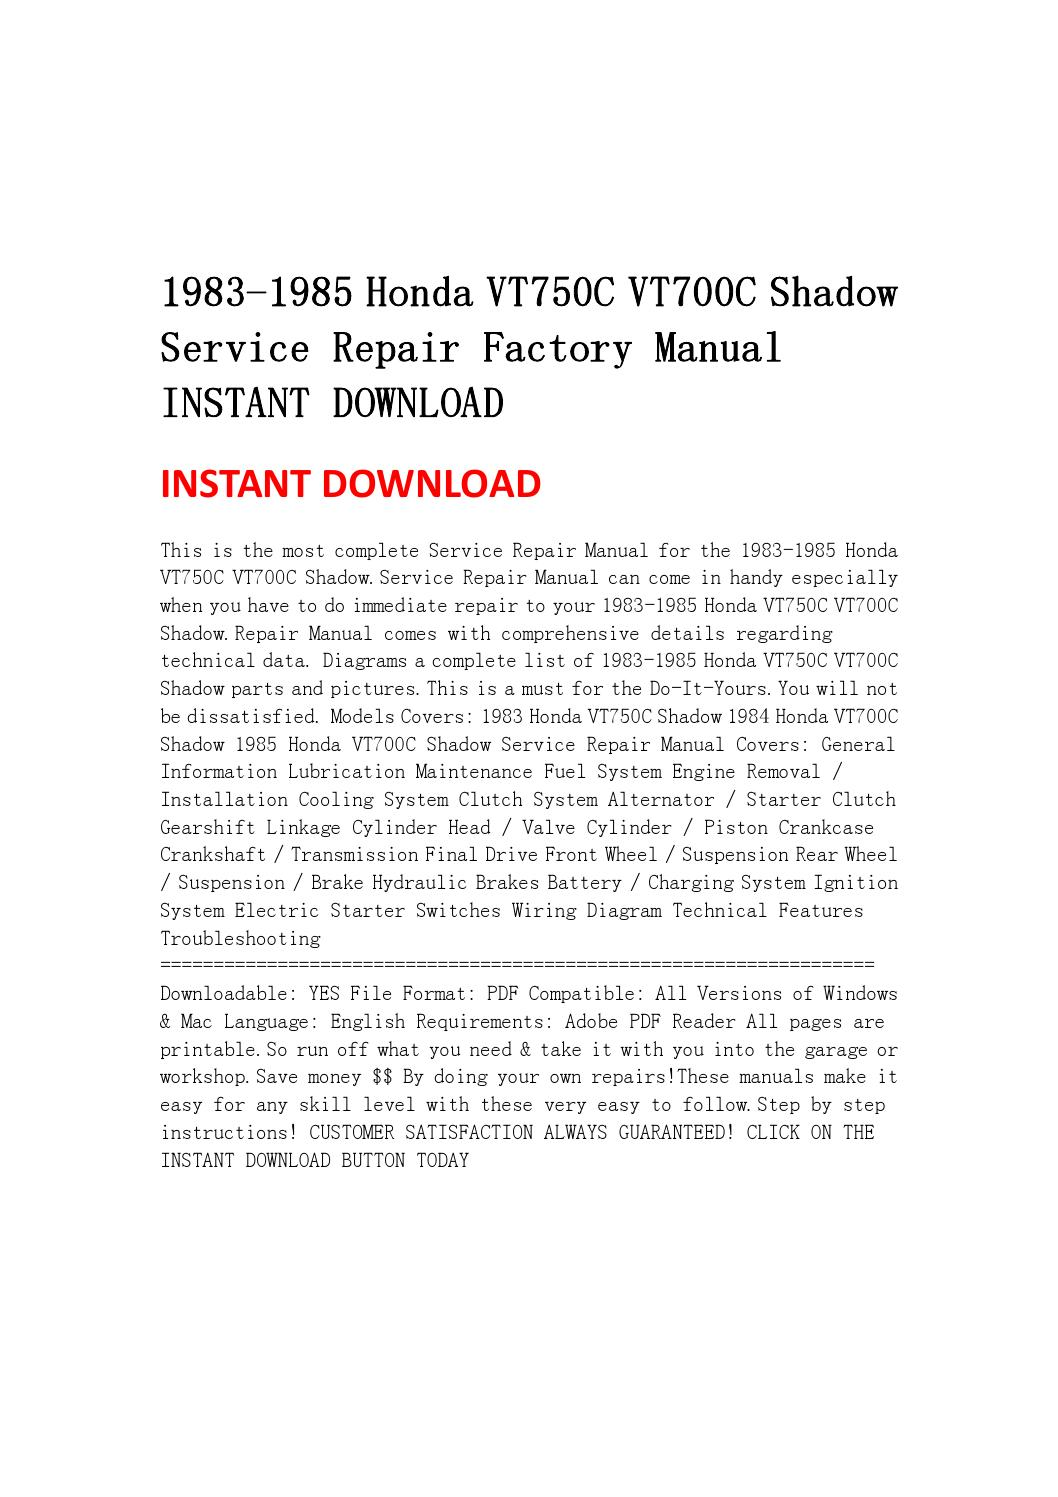 Page on 1984 Honda Vt700c Shadow Diagram